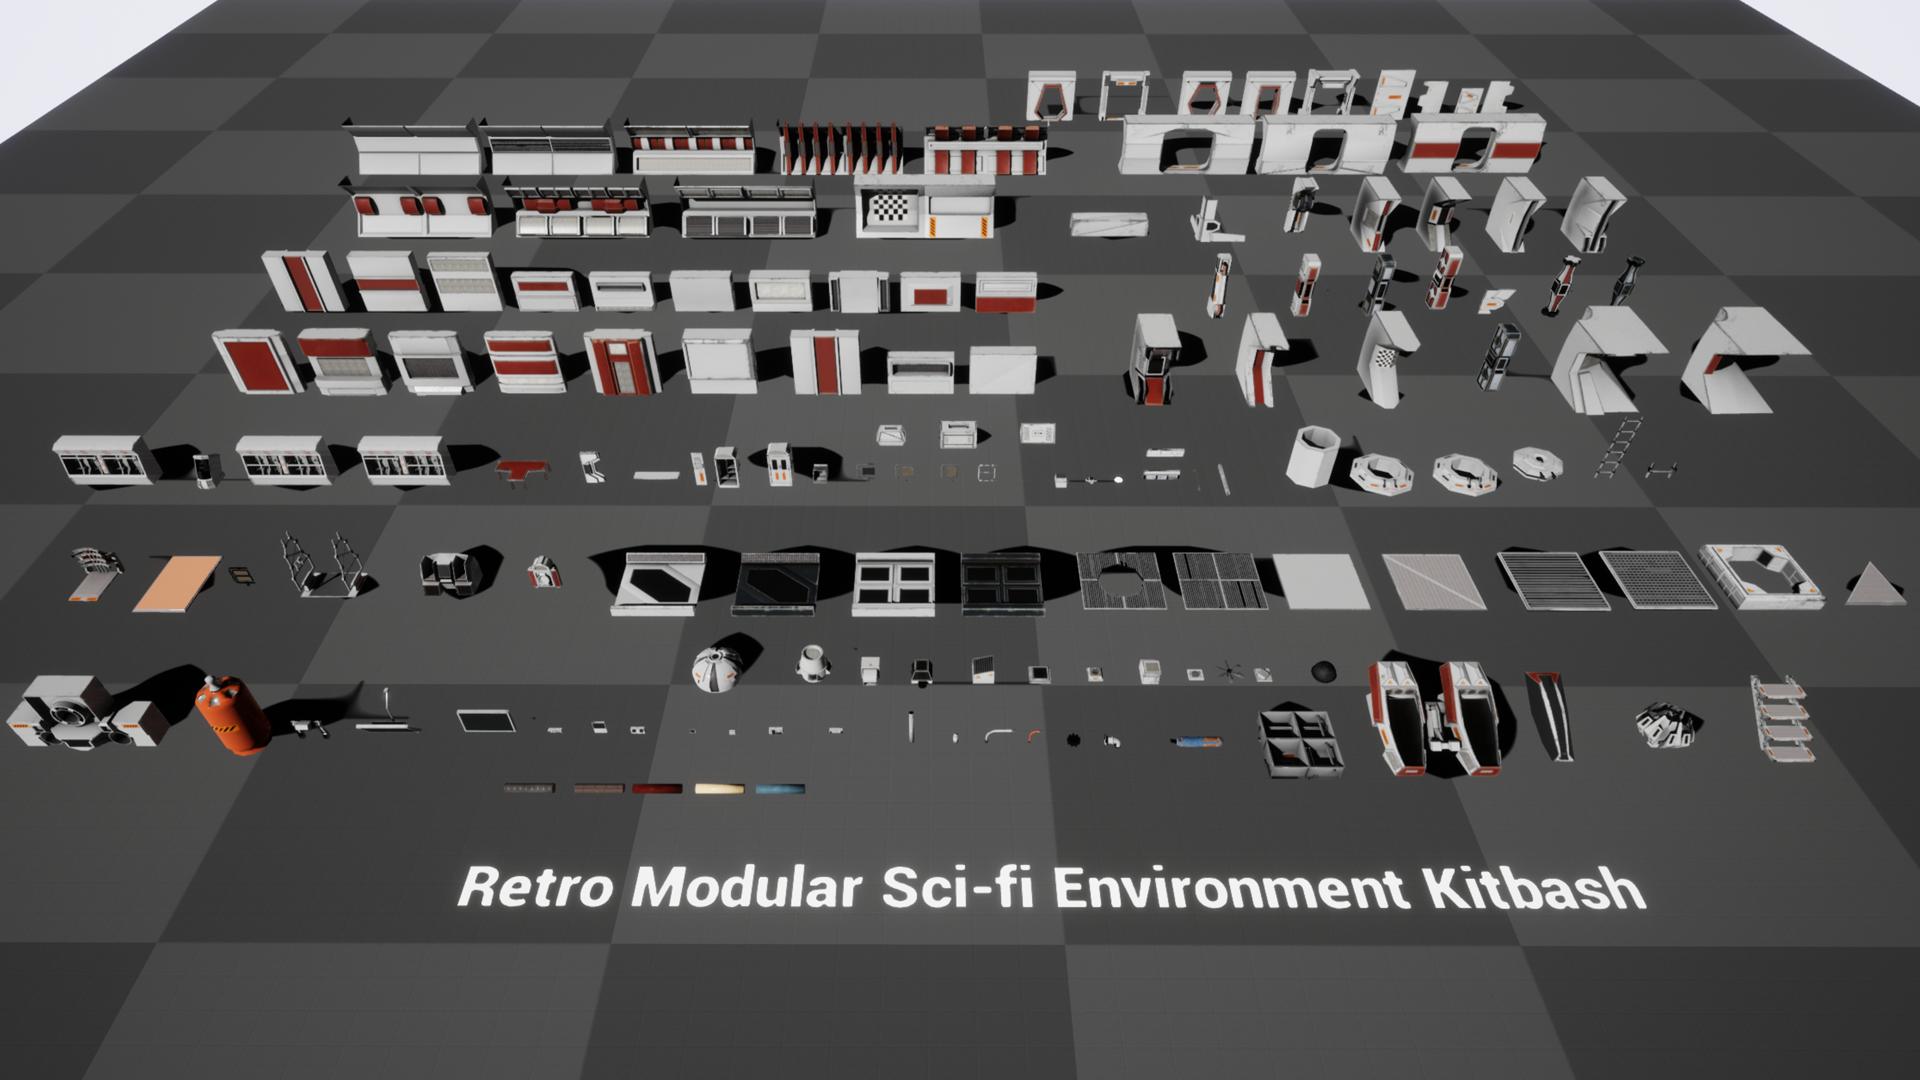 Retro Modular Sci-fi Environment Kit-bash by Shaun T  Williams in